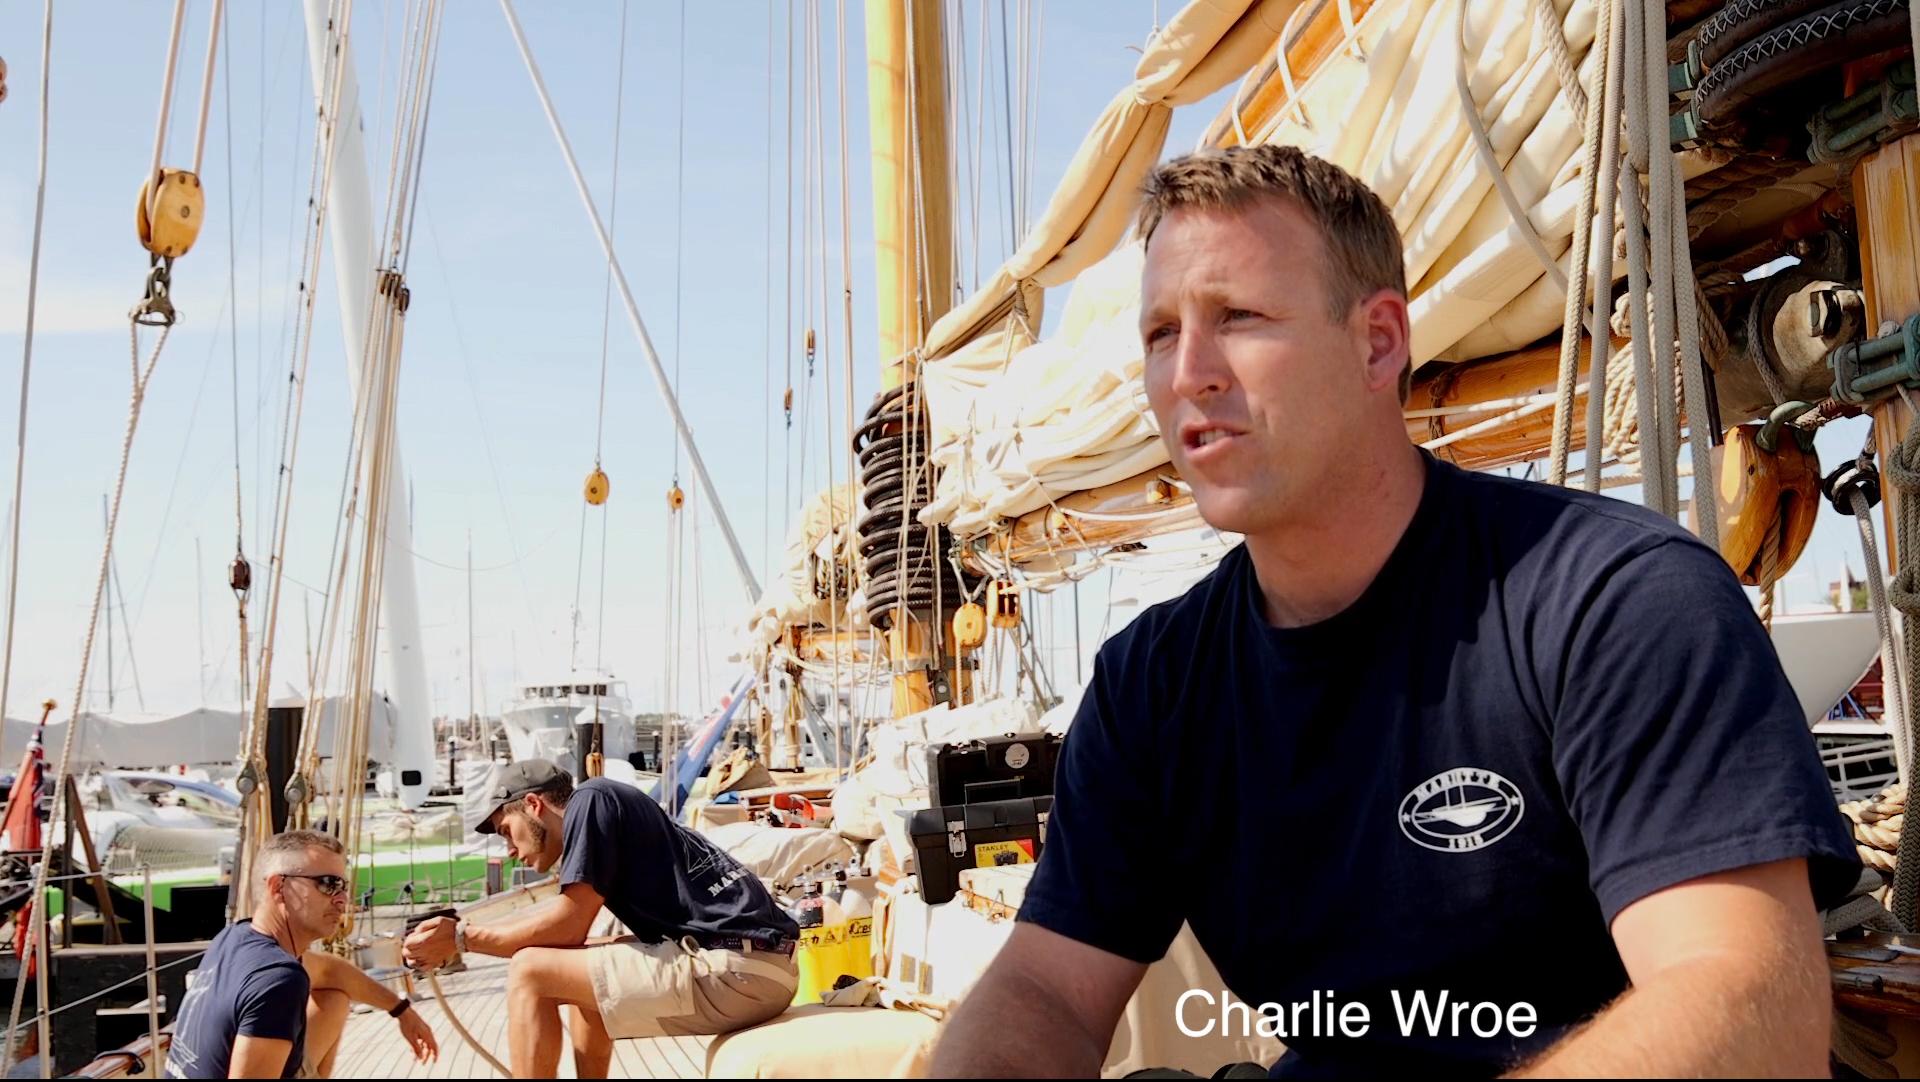 TR_classic-yacht-tv_Mariette_Charlie-Wroe_TransatlanticRace2015.jpg